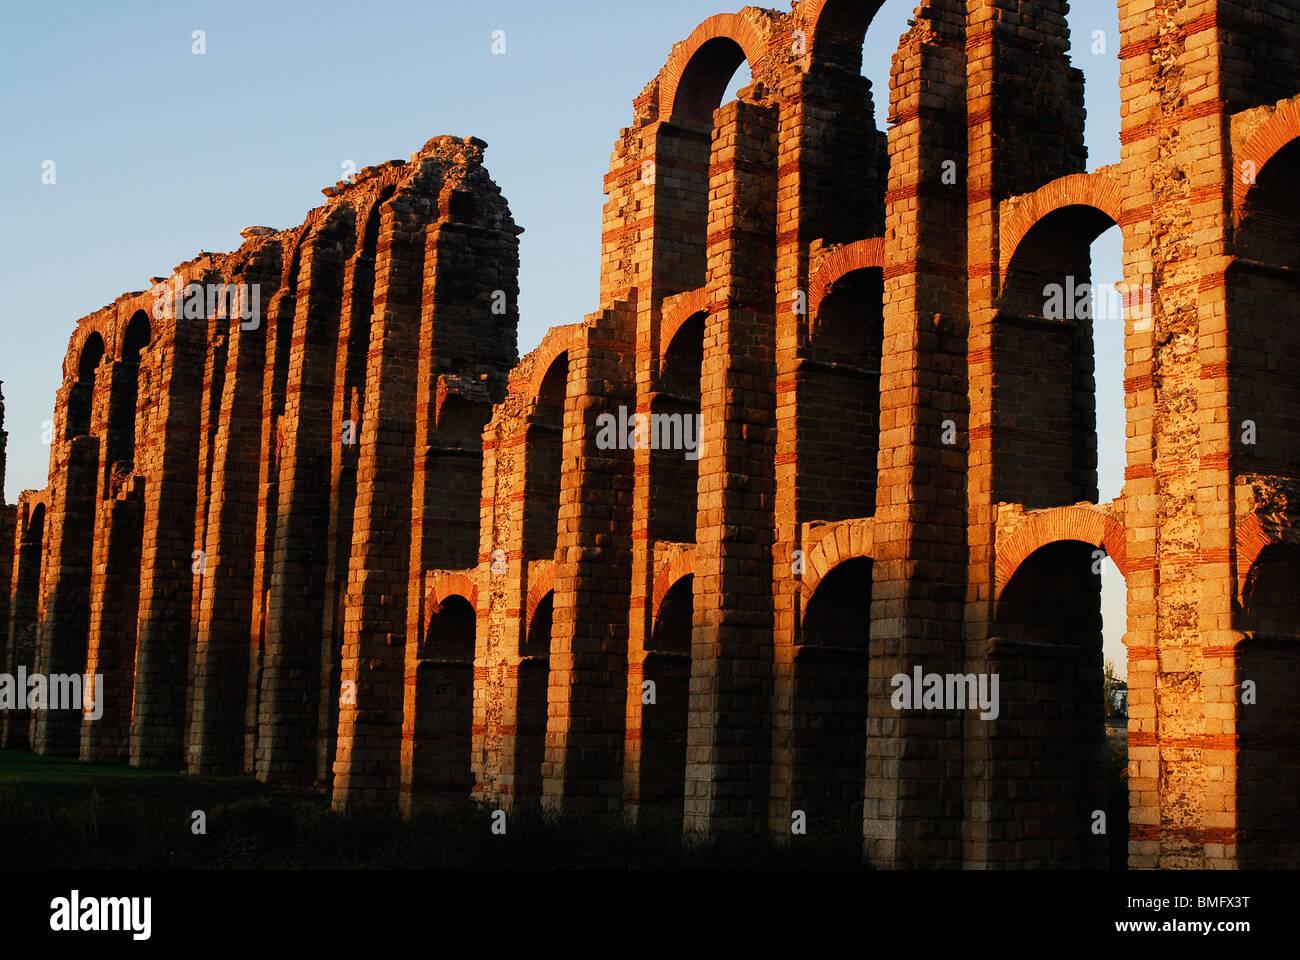 Acueducto Romano de los Milagros. Merida. Extremadura, España. Roman Aqueduct of The Miracles. Merida. Extremadura. - Stock Image